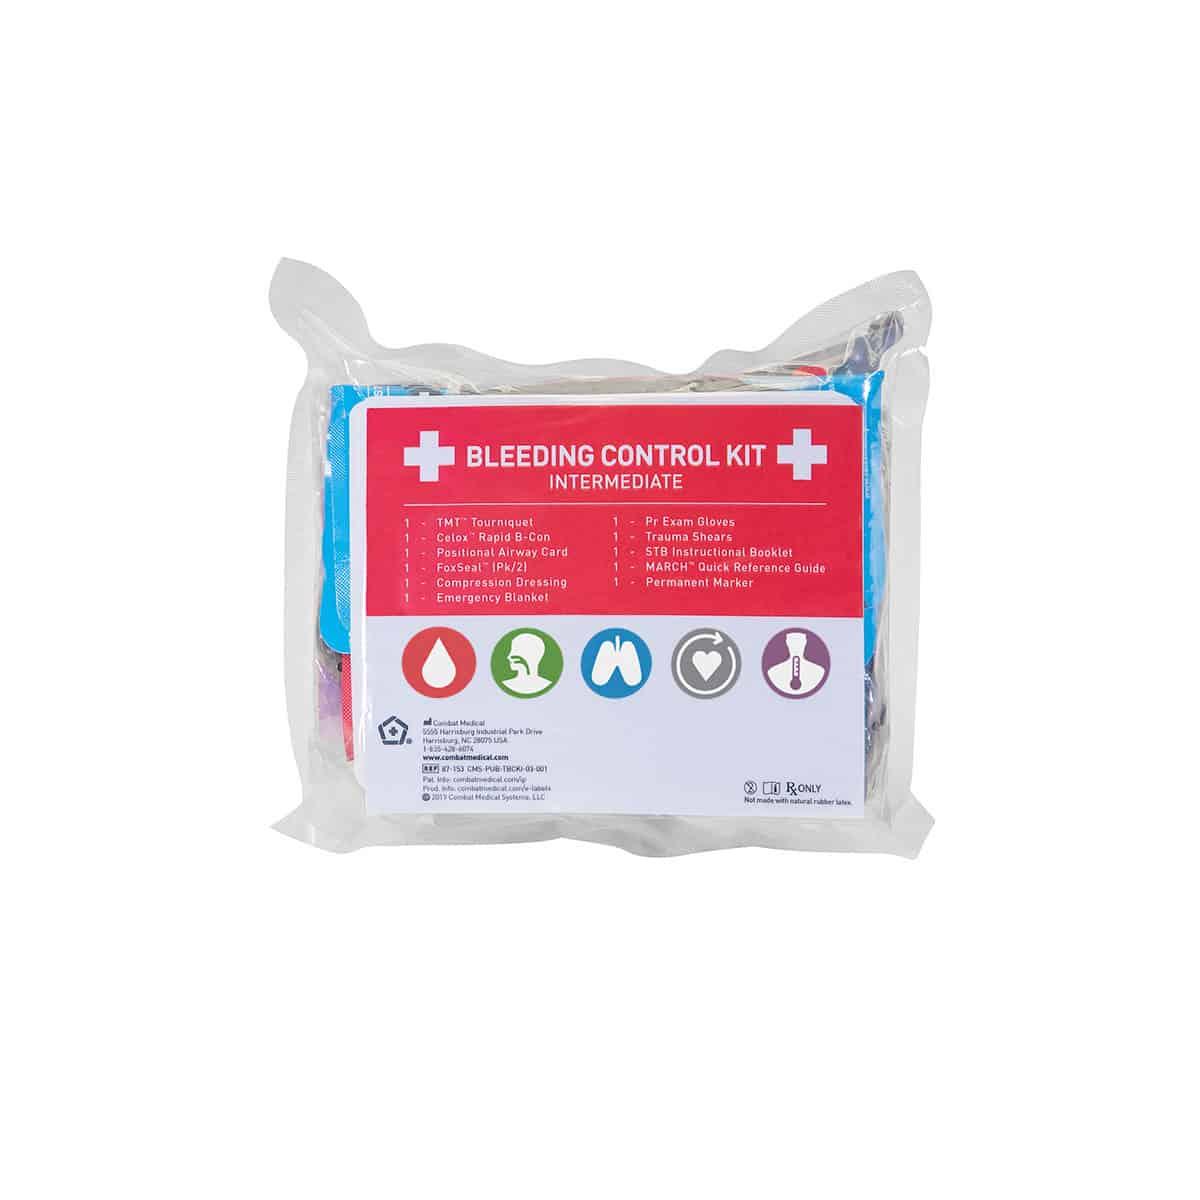 bleeding control kit intermediate front